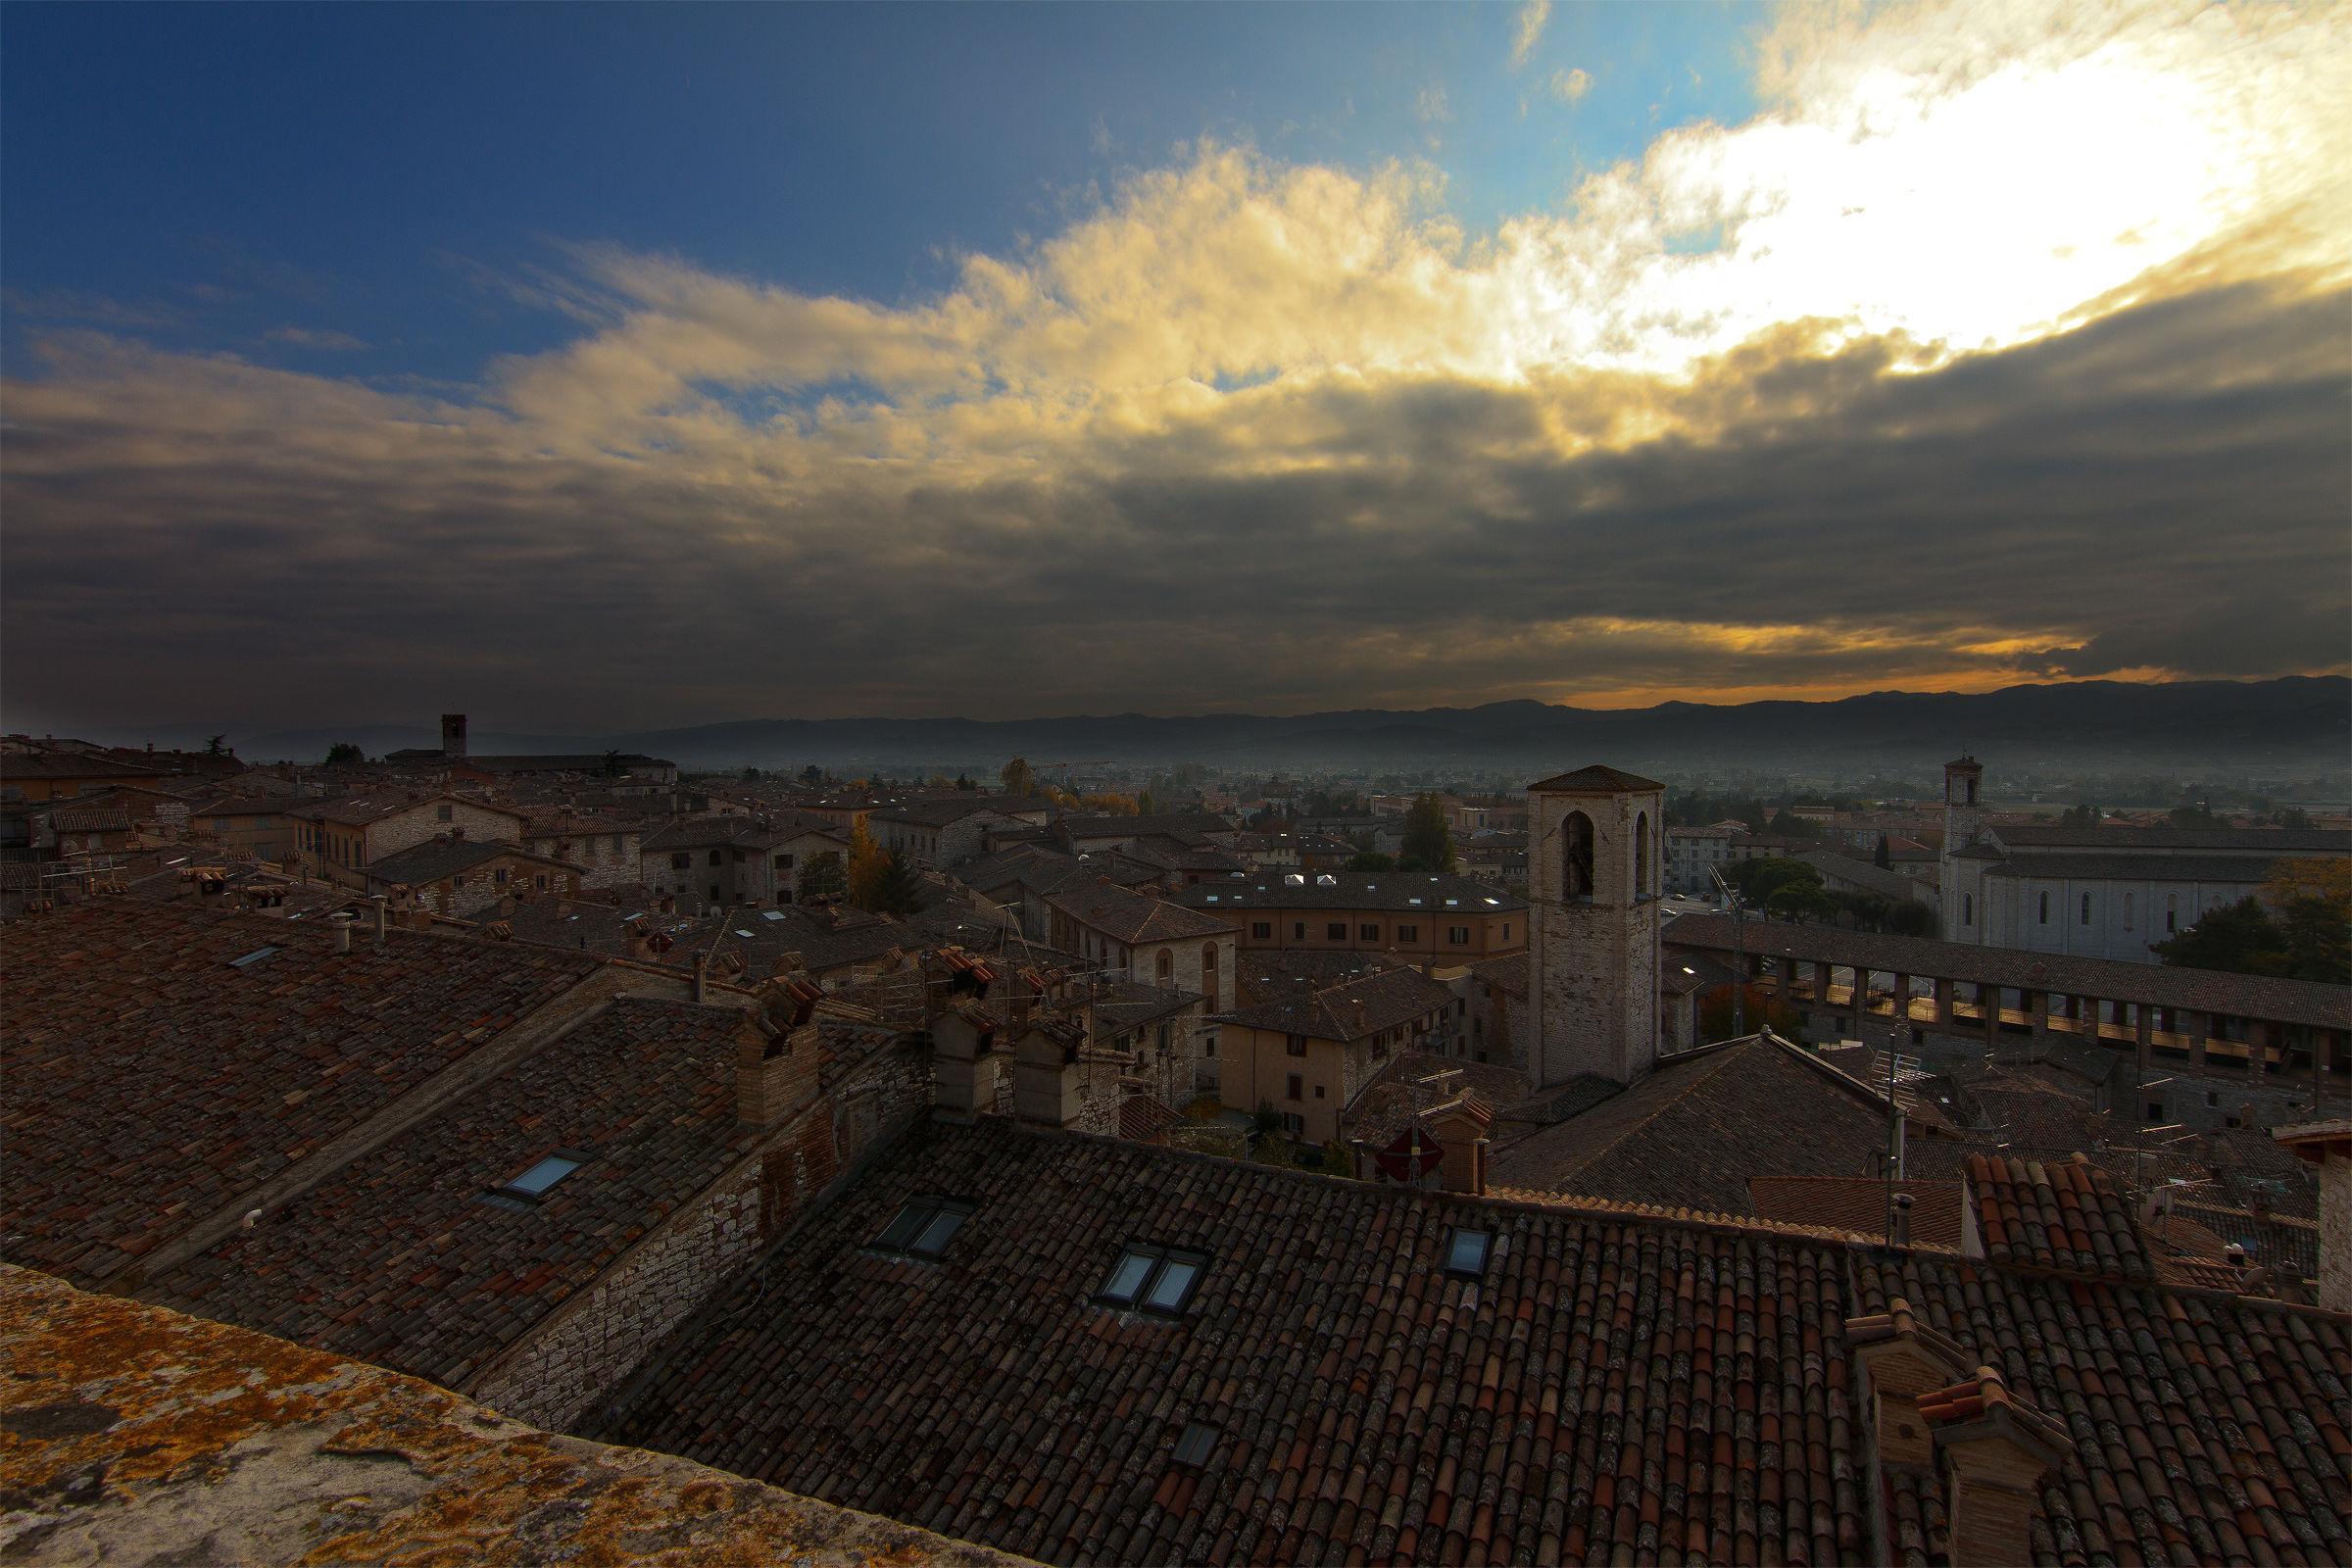 Davanti a Gubbio...